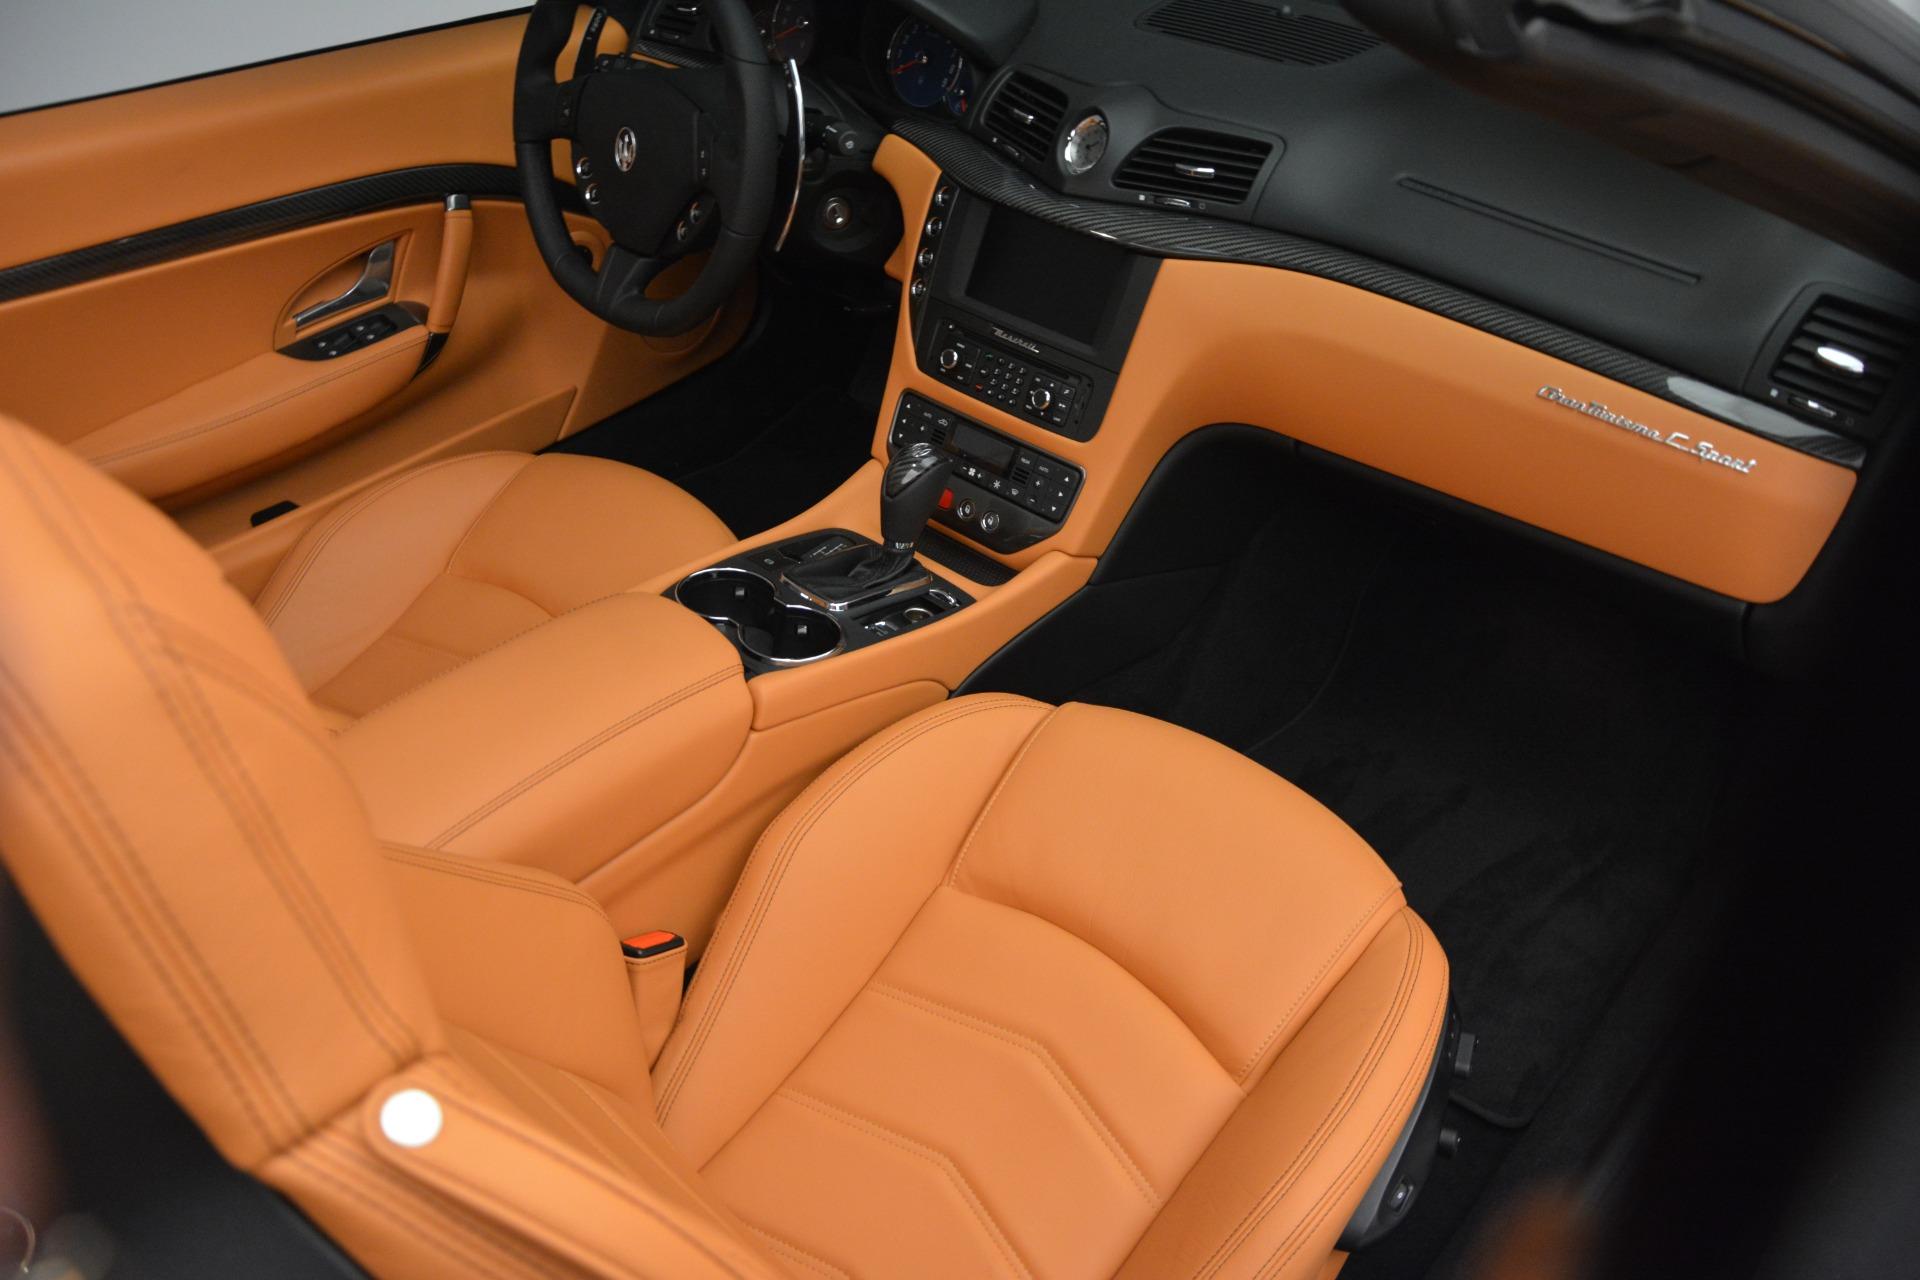 Used 2015 Maserati GranTurismo Sport Convertible For Sale In Westport, CT 2129_p23